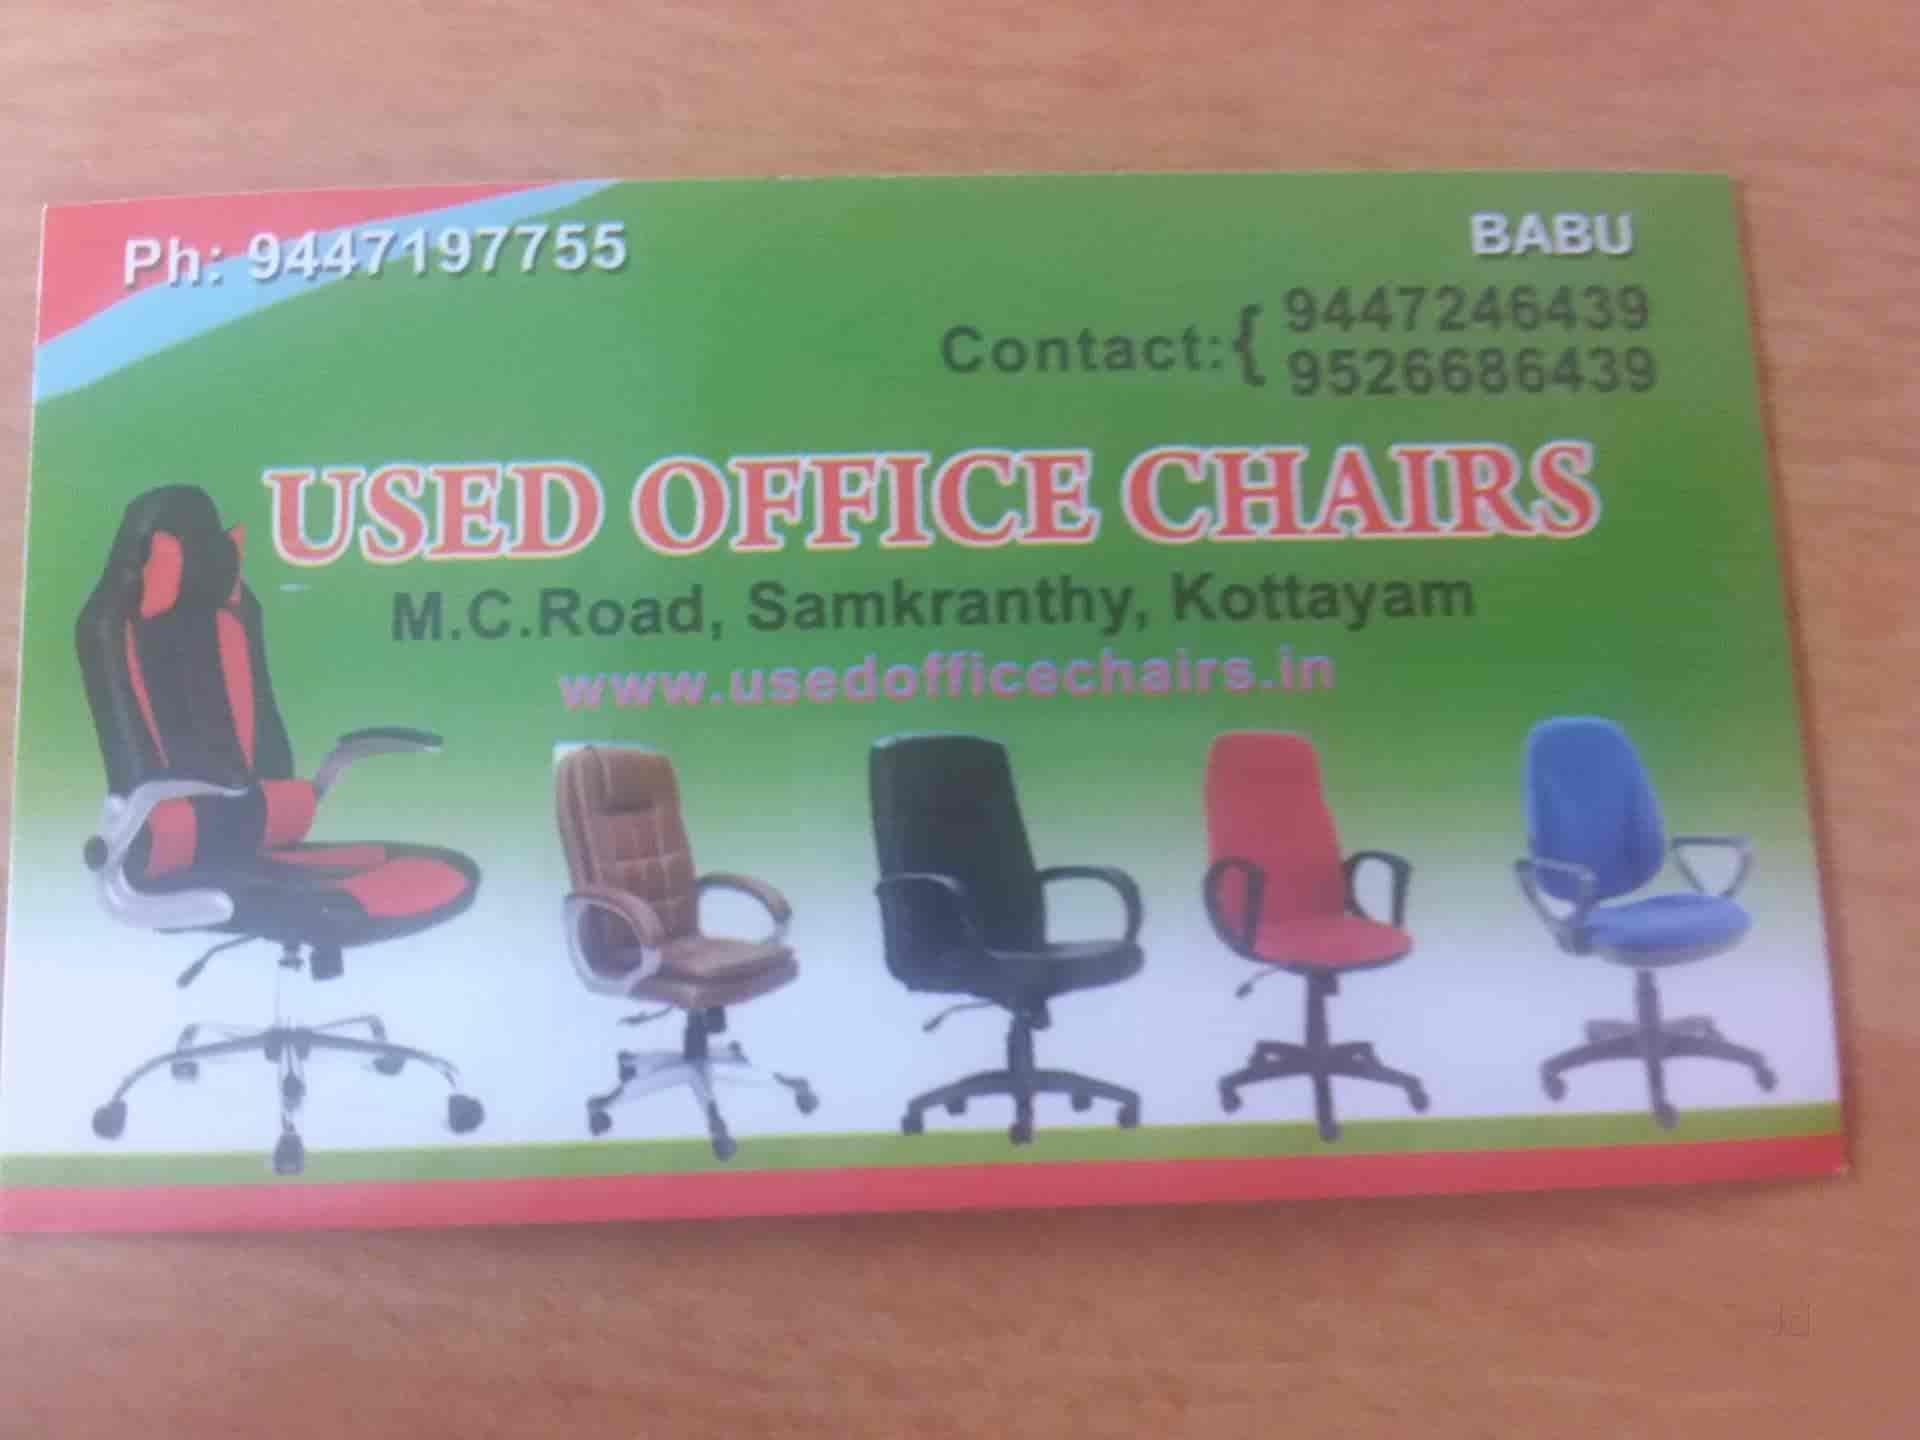 Used Office Chairs Kumaranalloor Office Chair Dealers In Kottayam